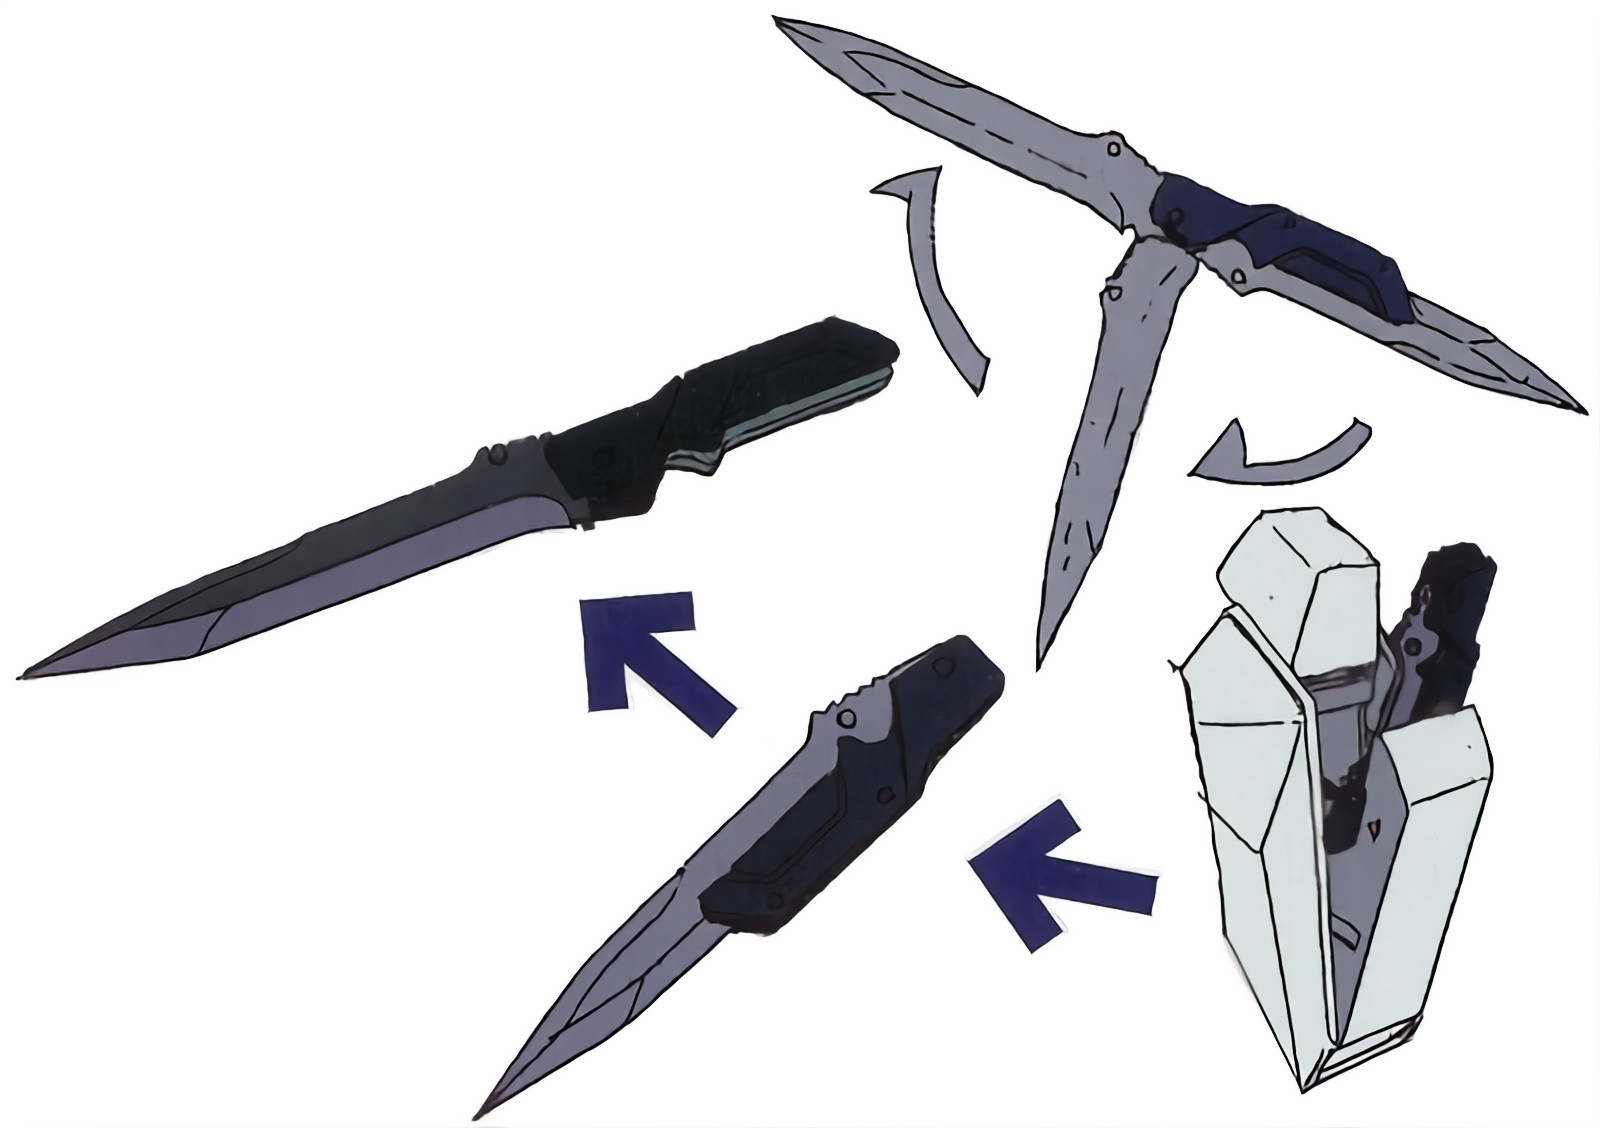 File:Gat-x105-armorschneider.jpg